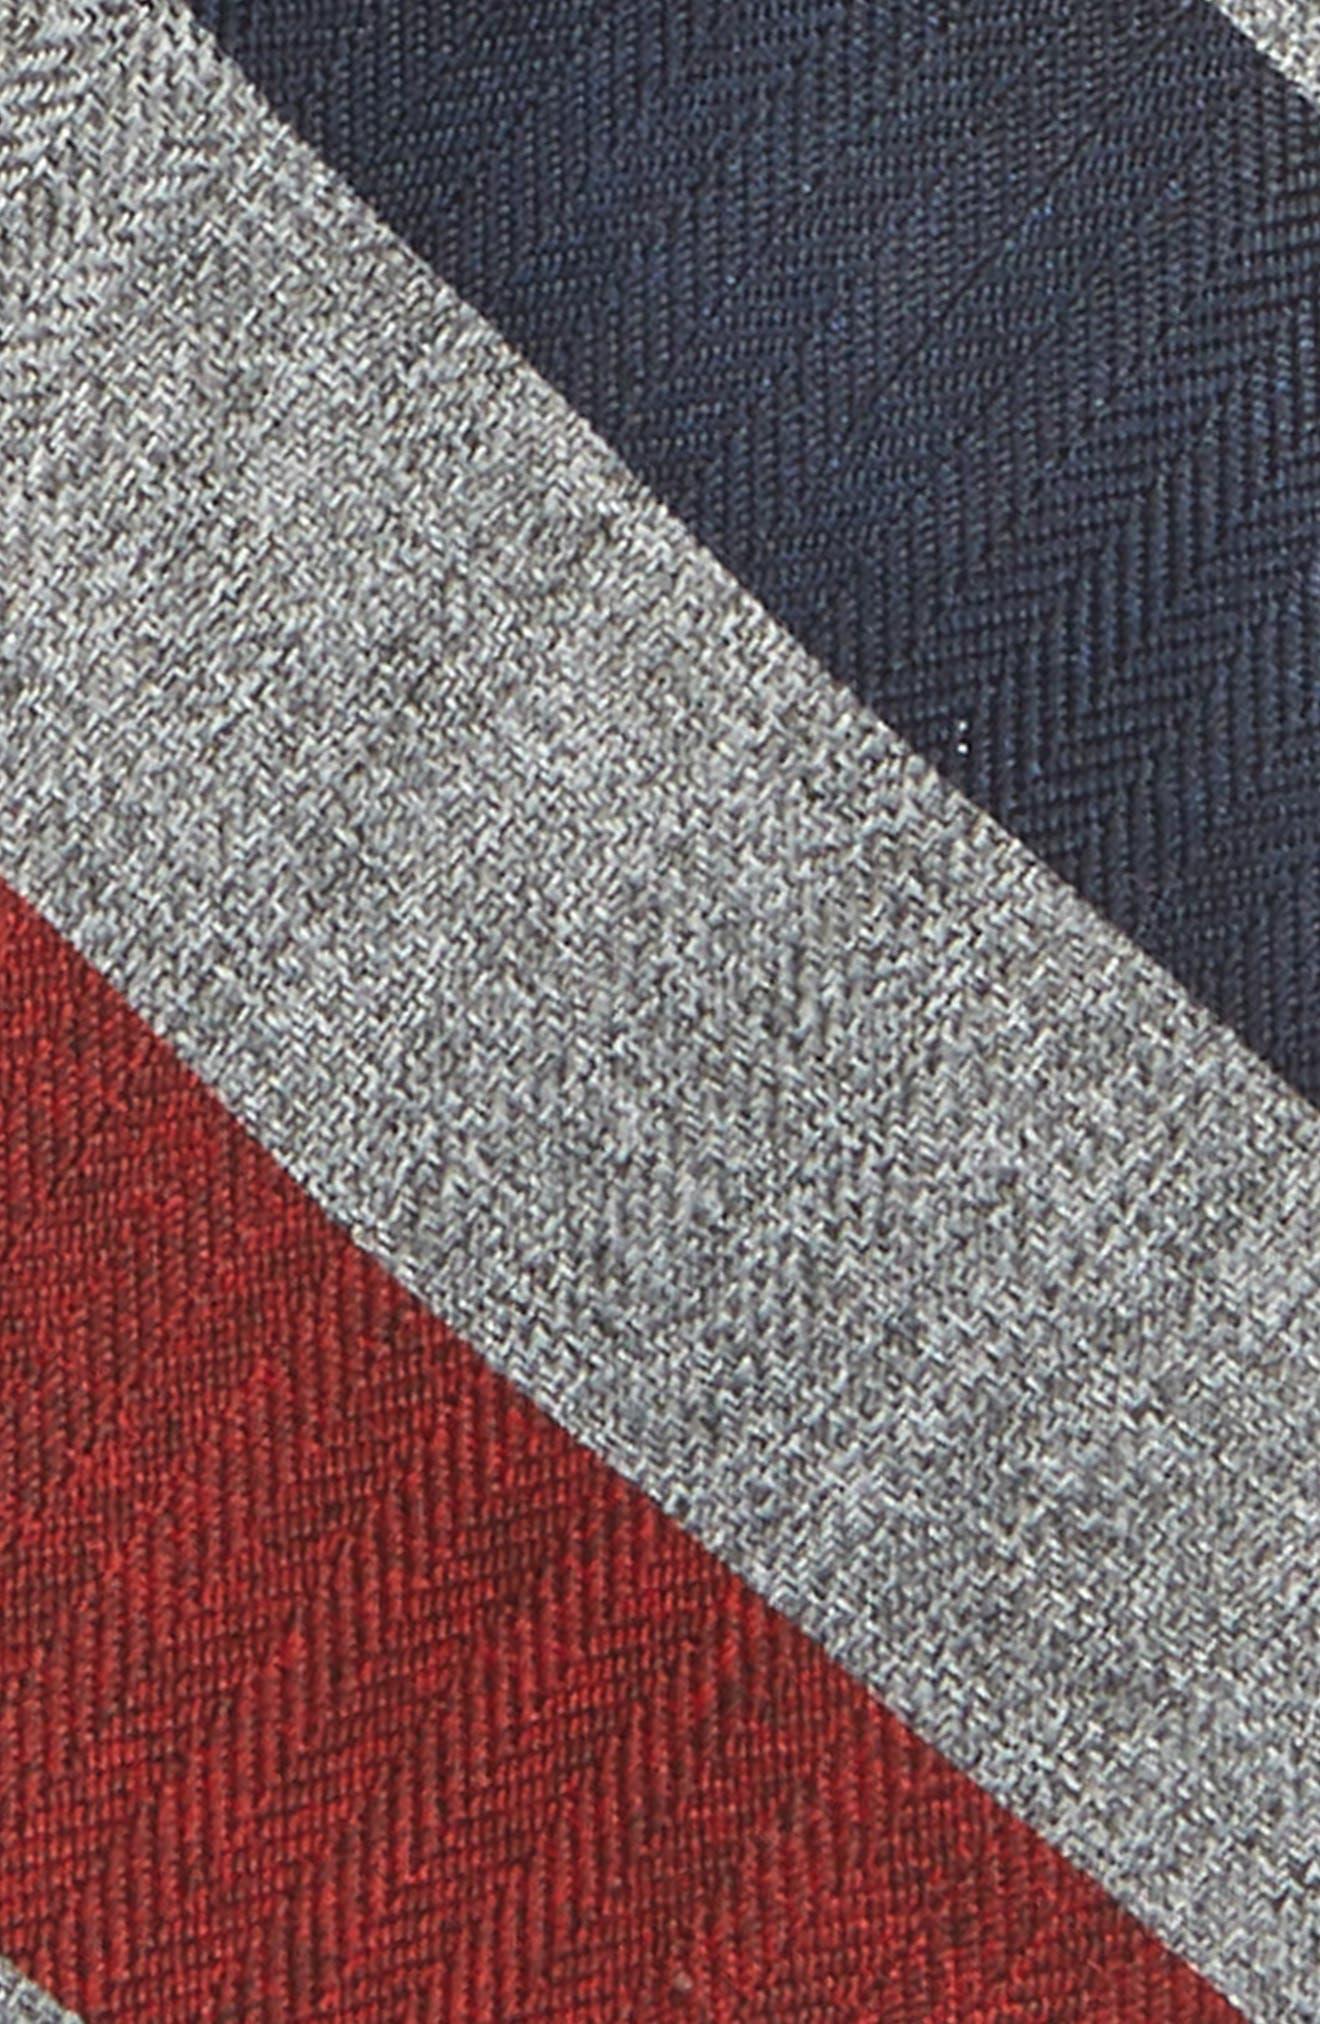 Stripe Tie,                             Alternate thumbnail 2, color,                             RED